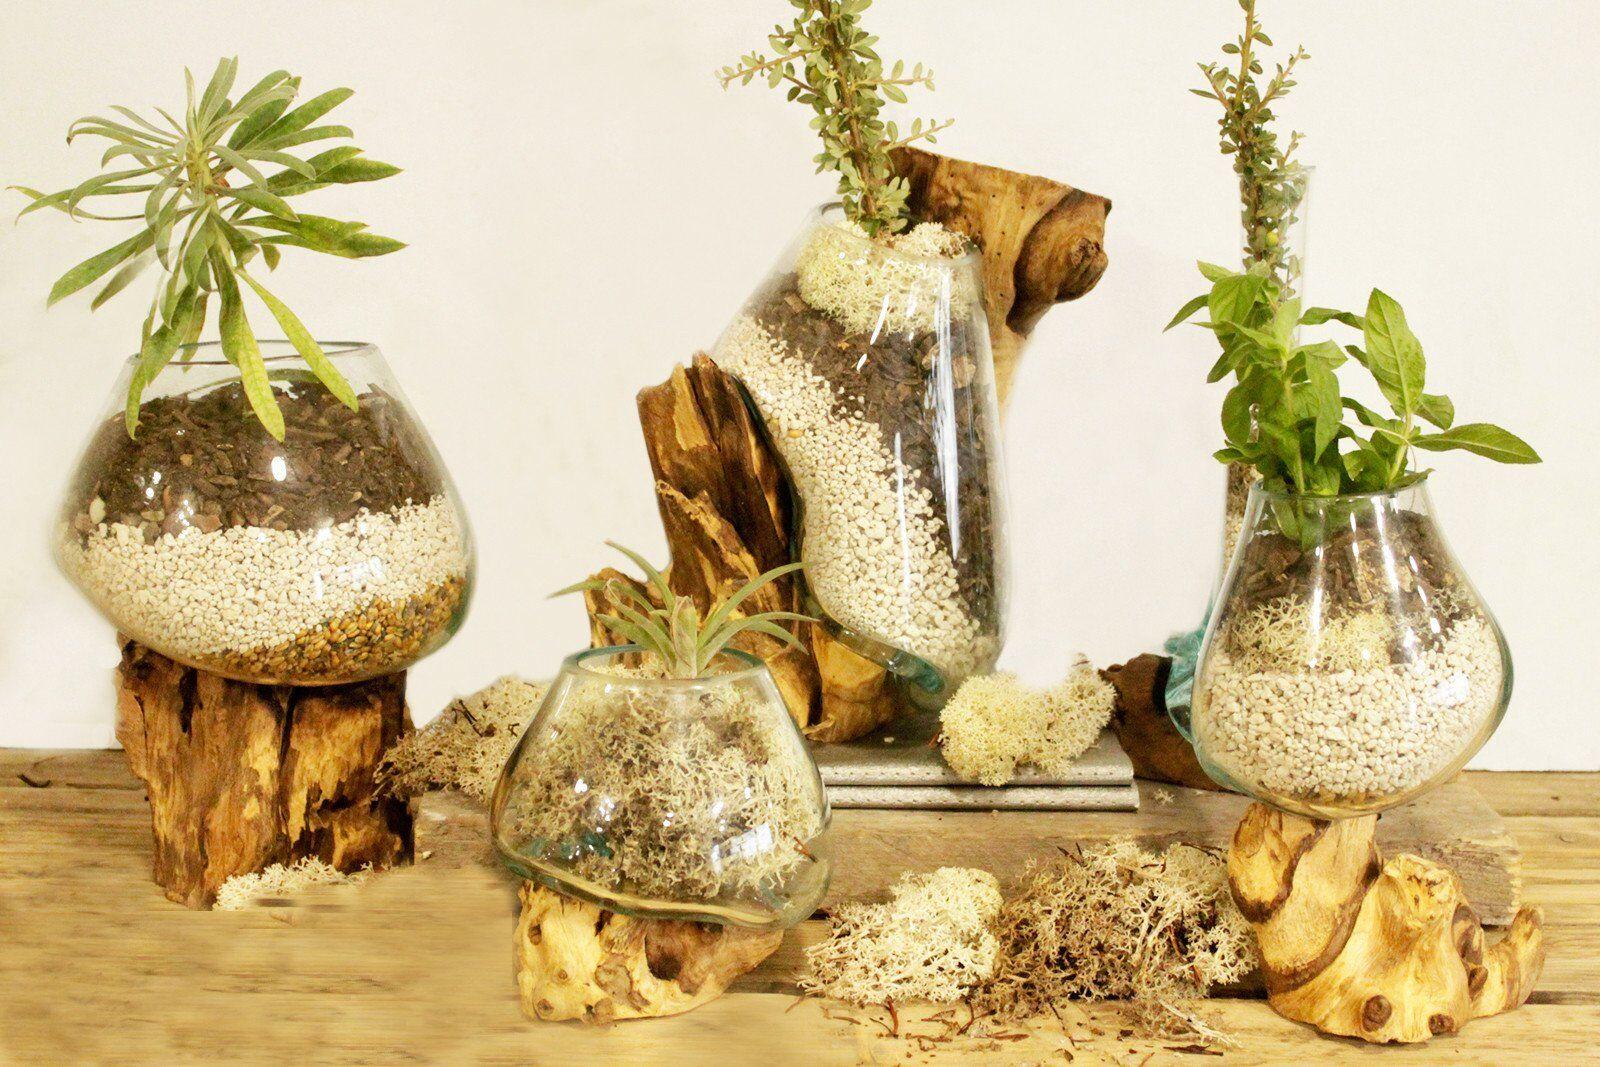 G11 Handmade Melted Molten Glass on Teak Wood Air Plants Holder Cut Flower Fish